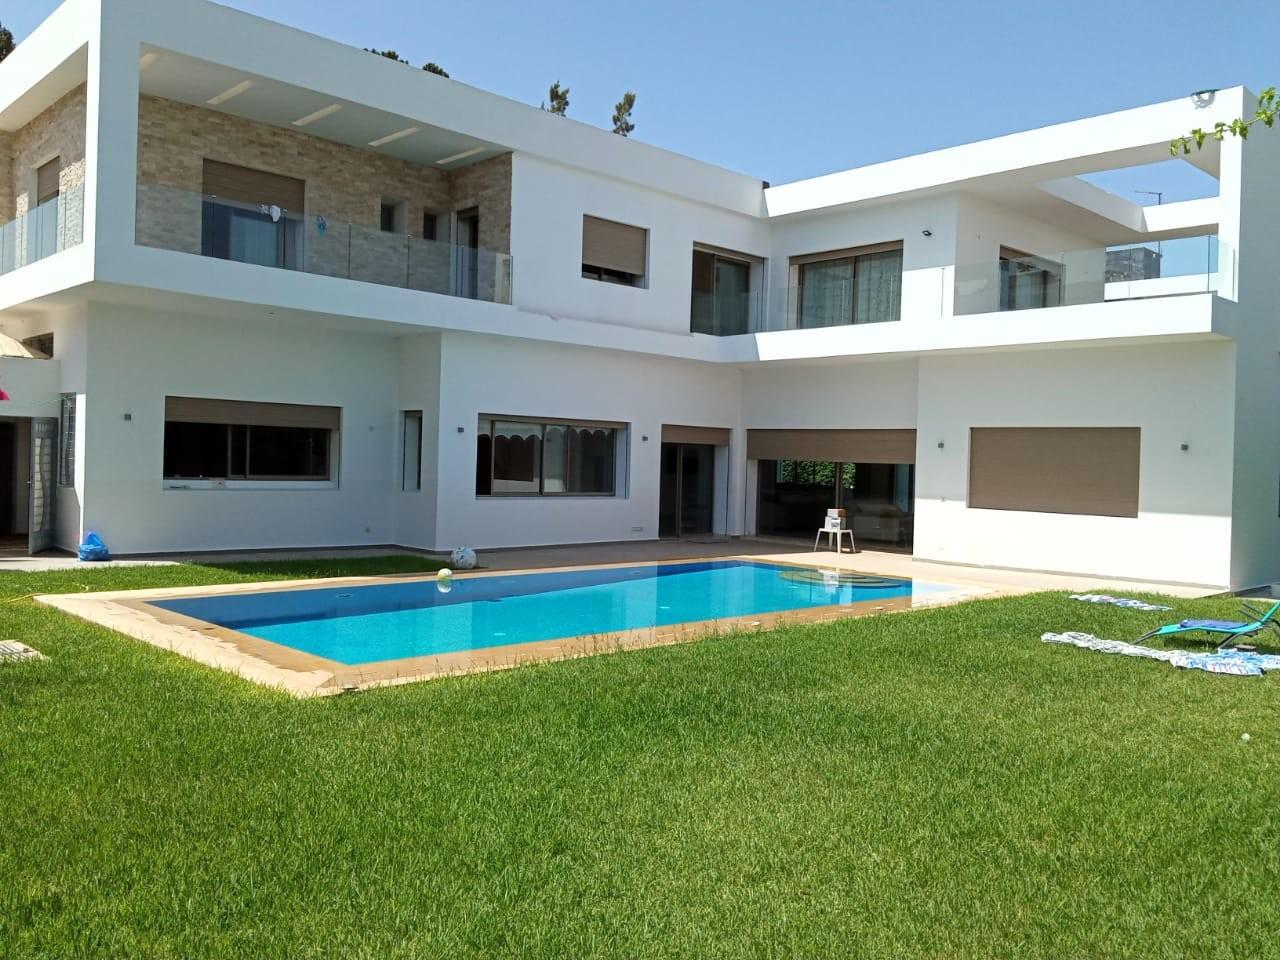 Vente <strong>Villa</strong> Rabat Souissi <strong>1000 m2</strong>